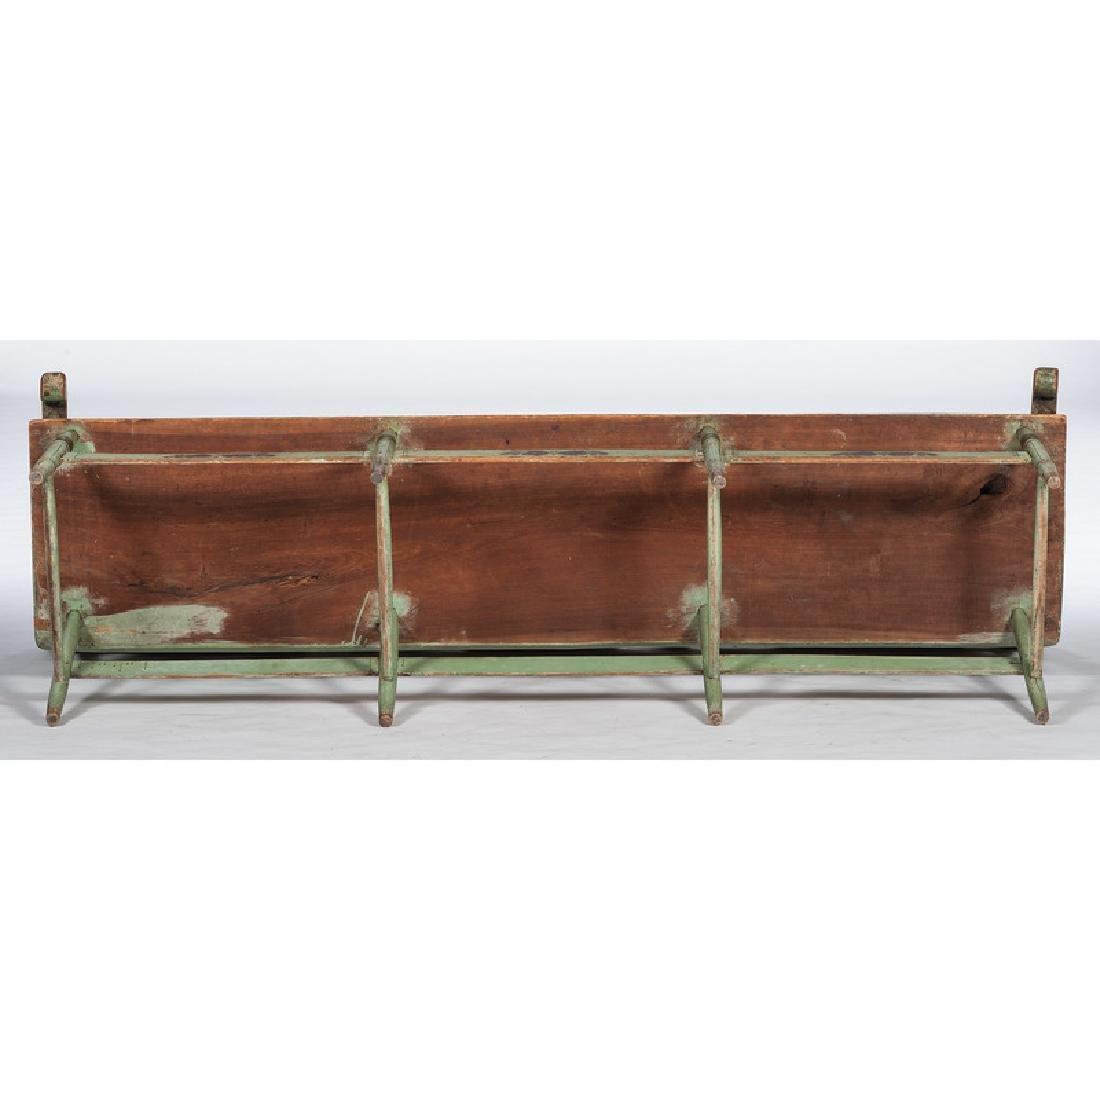 Painted Pennsylvania Settle Bench - 2